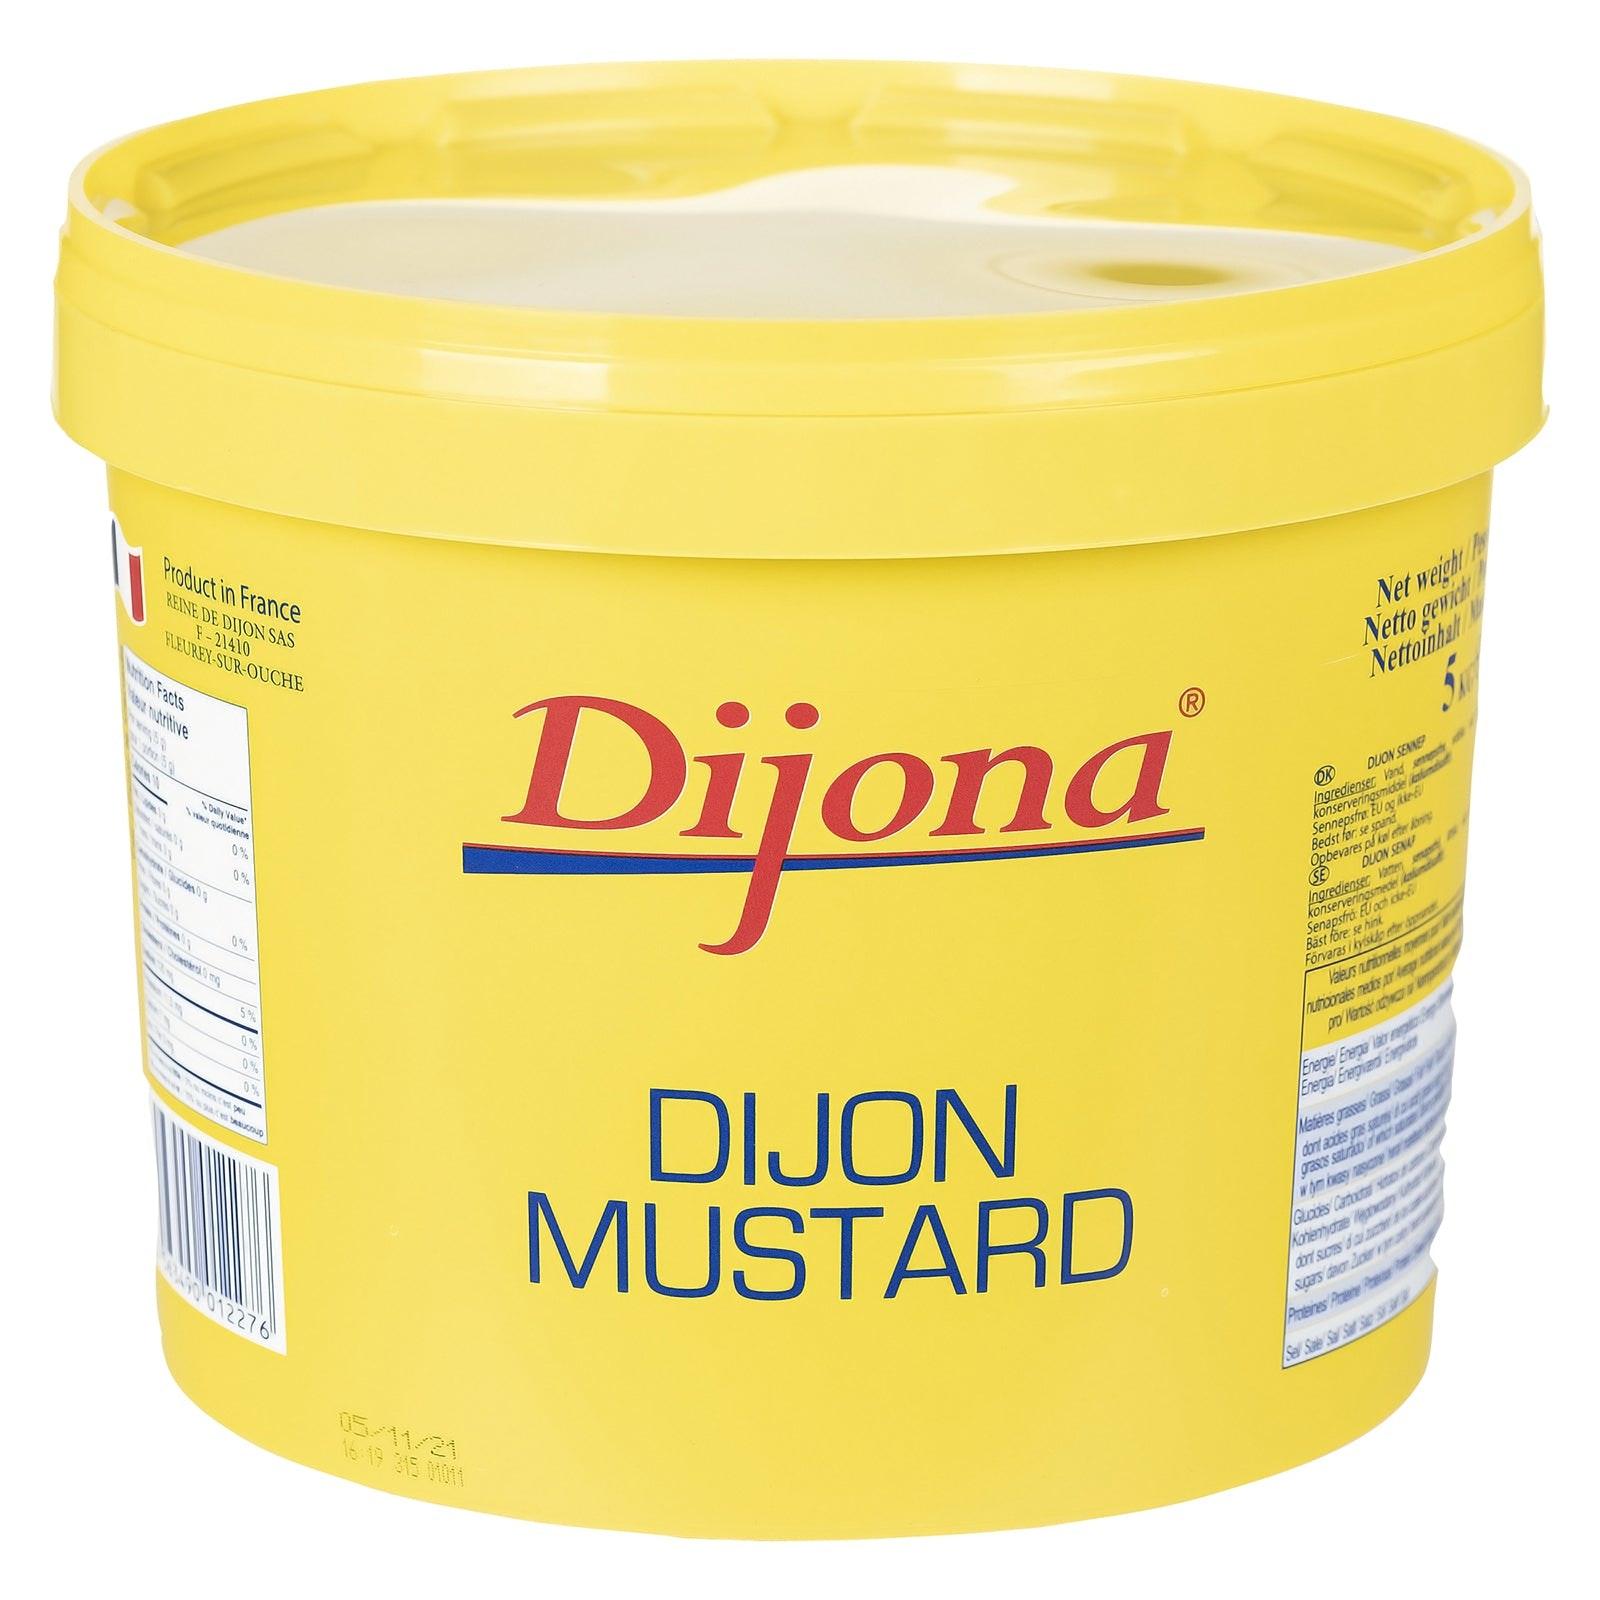 DIJONA Dijon mustard extra strong in pails